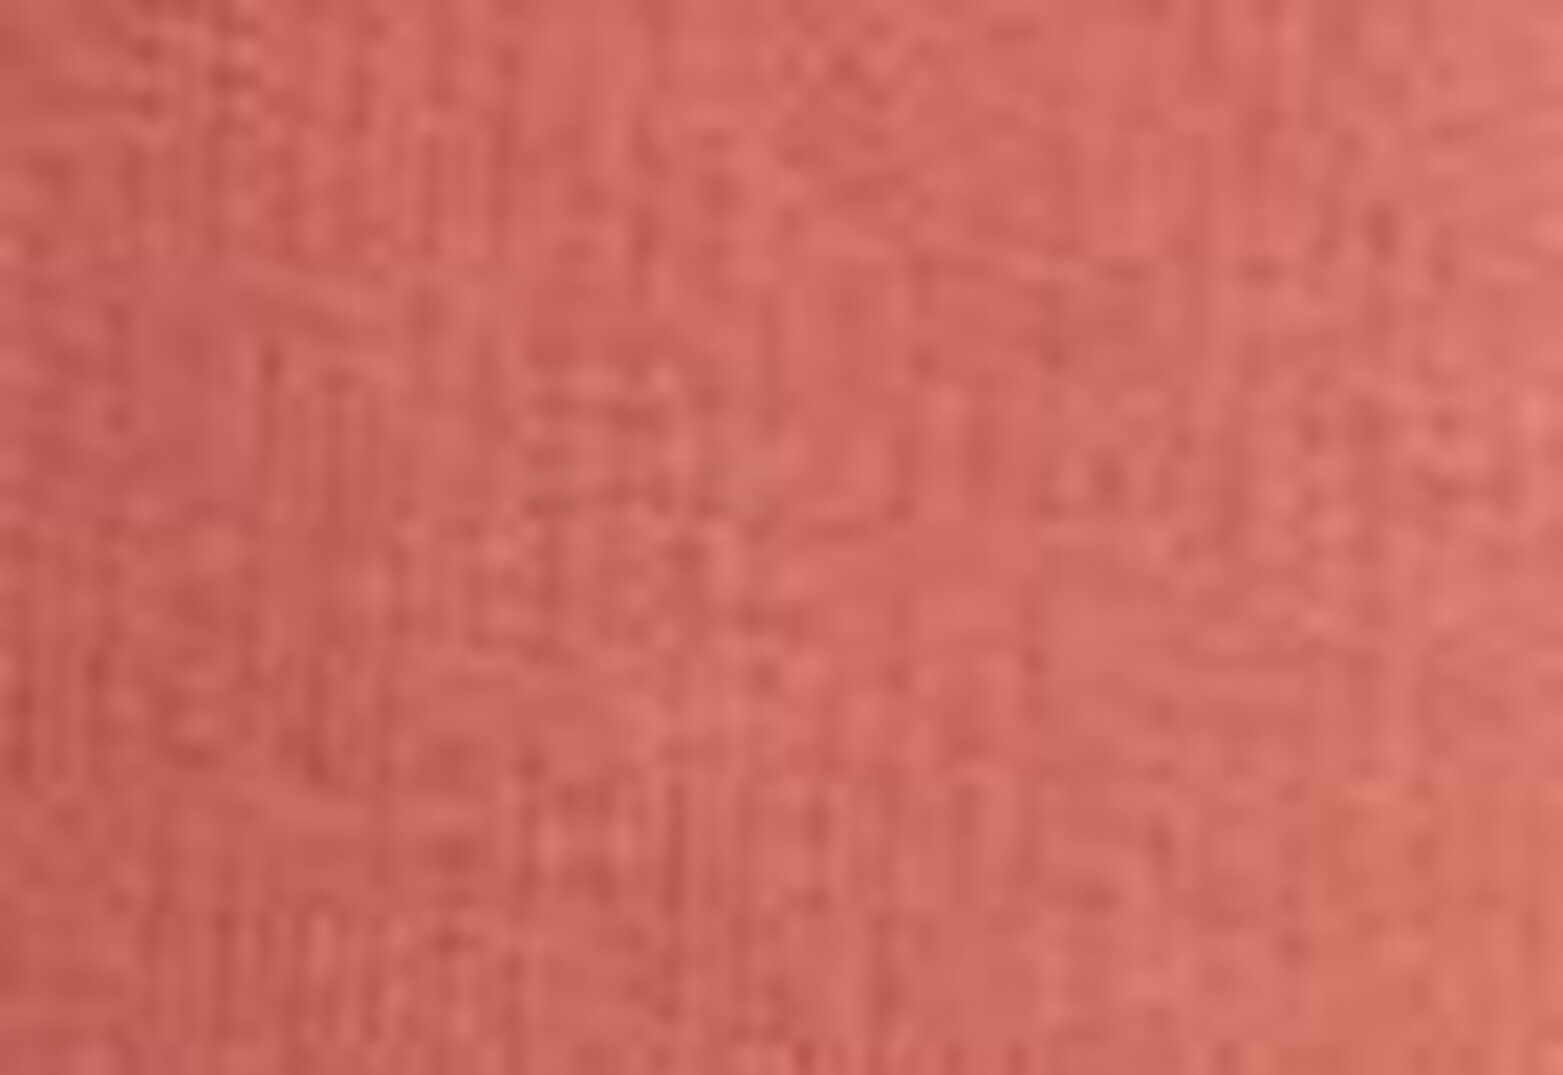 Red Tab Sweats Zip Hoodie Kadın Kırmızı Hoodie